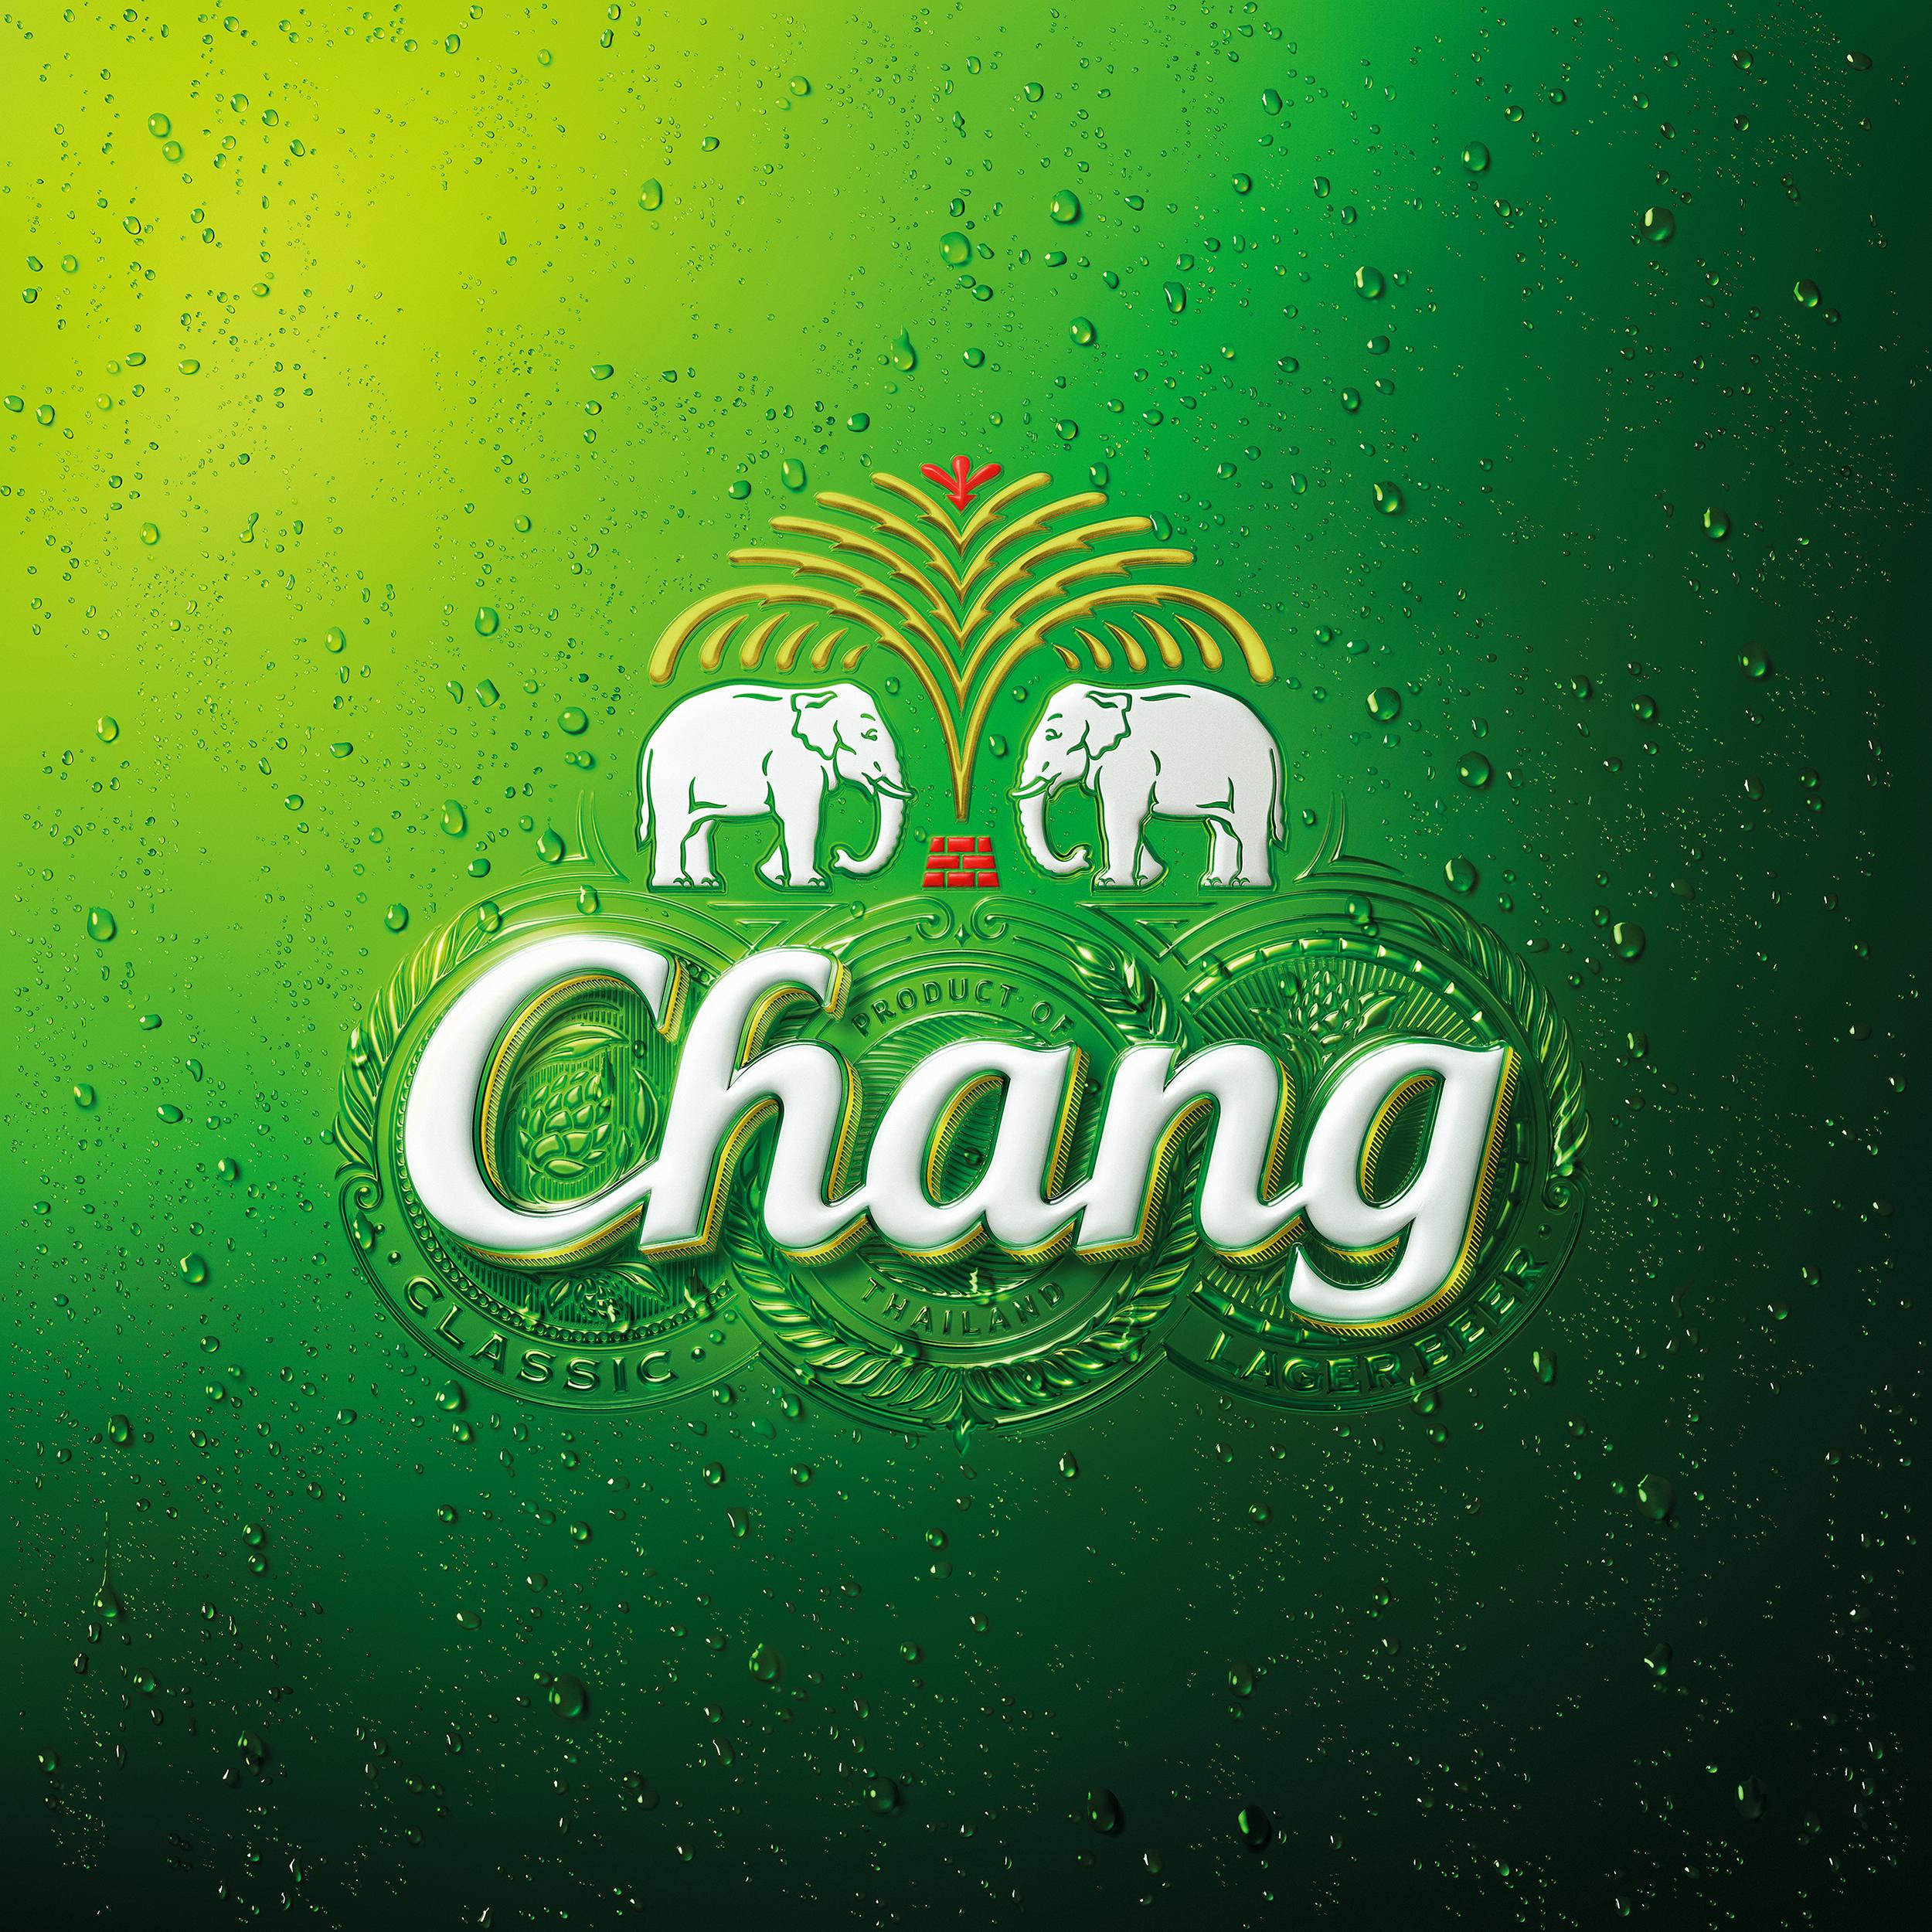 A_Chang_Logo_Stack_26_Water_drop_sRGB.jpg